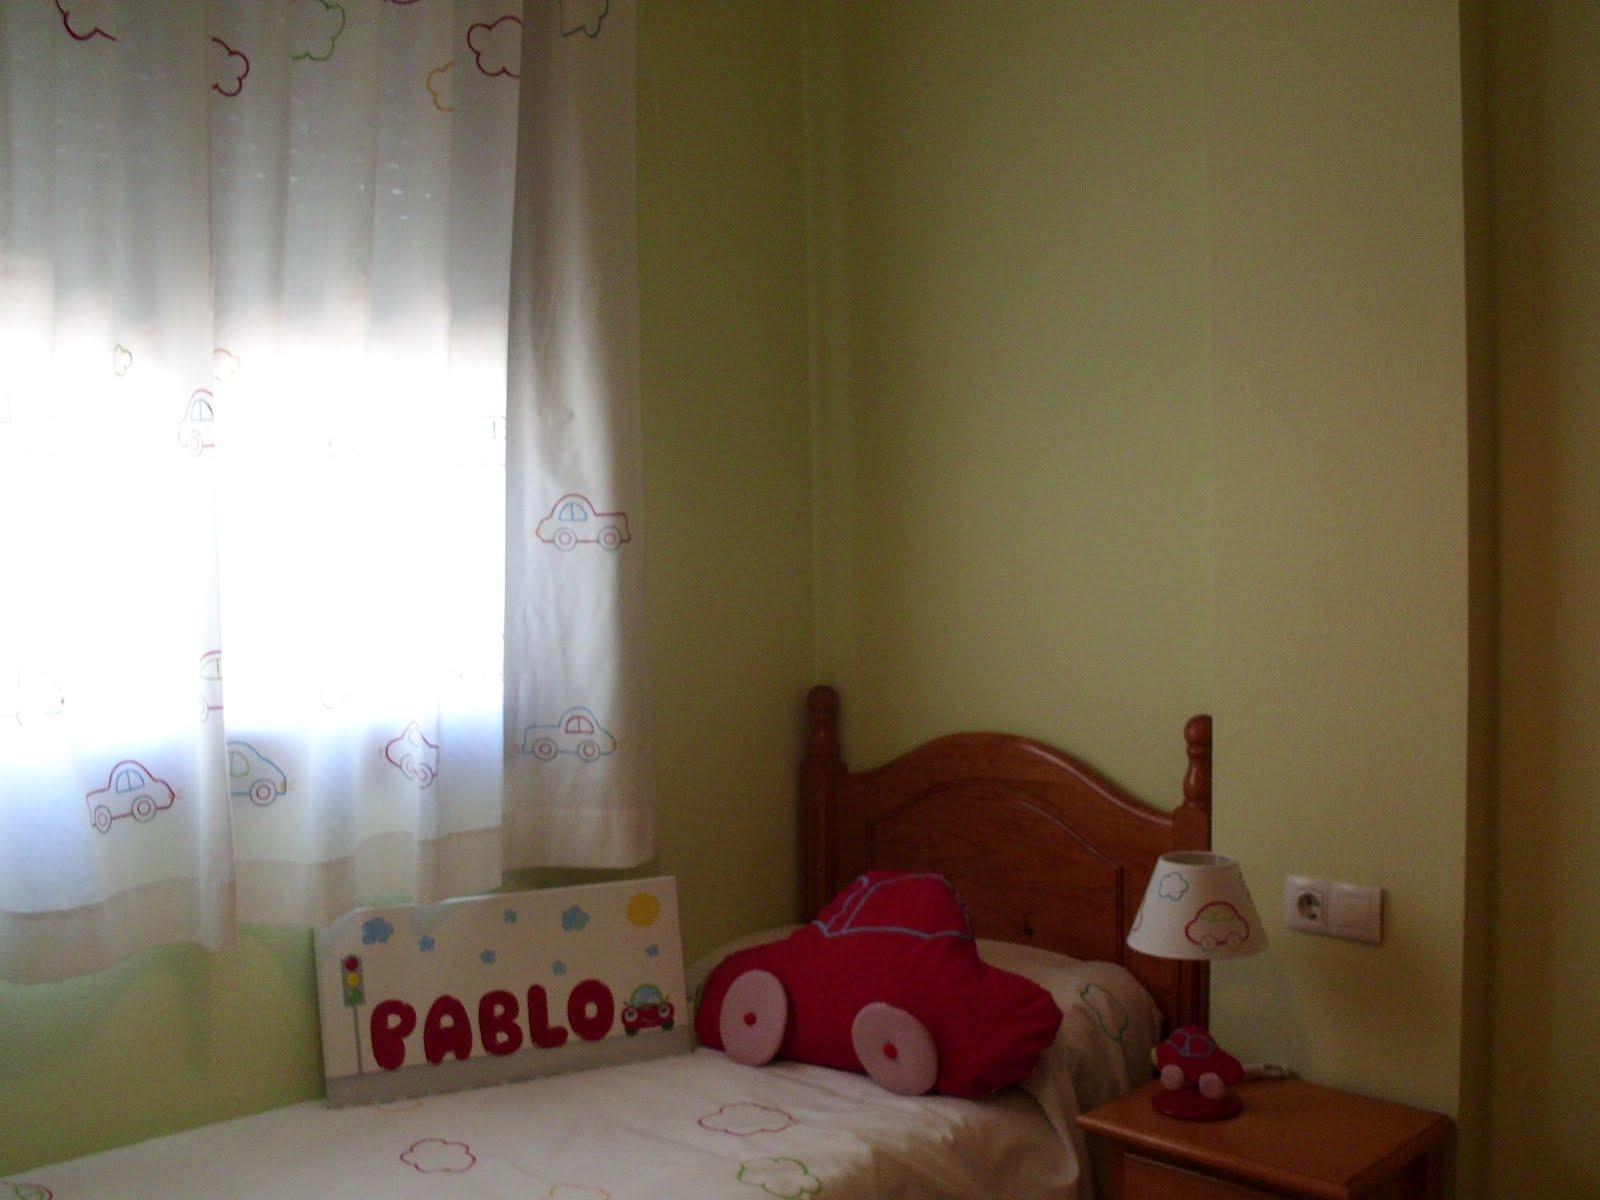 Decoraci n infantil pekerines habitaci n de pablo - Habitacion infantil decoracion ...